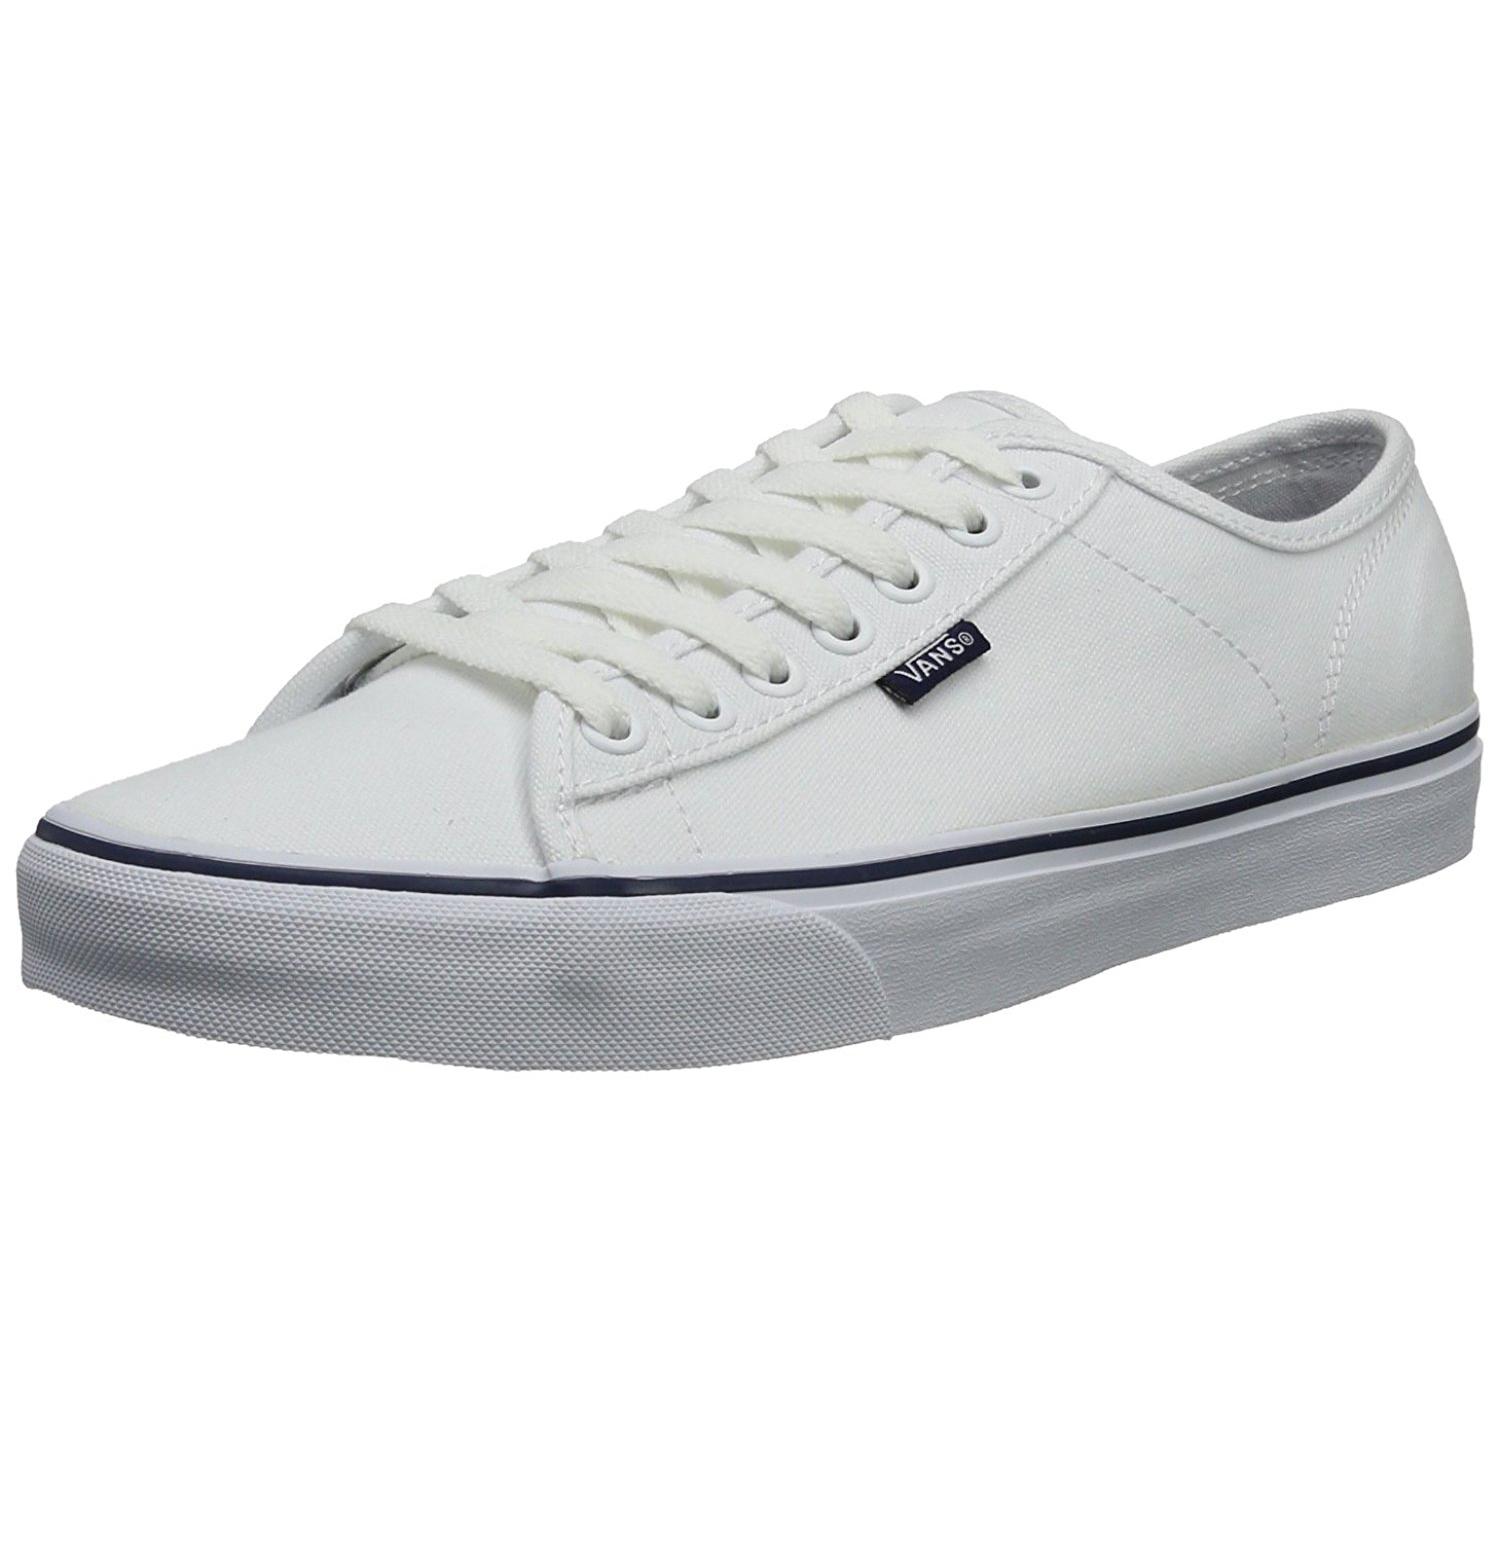 ad4291e63b VANS New Mens Ferris Stv Low Canvas Skater Shoes Plimsolls White ...